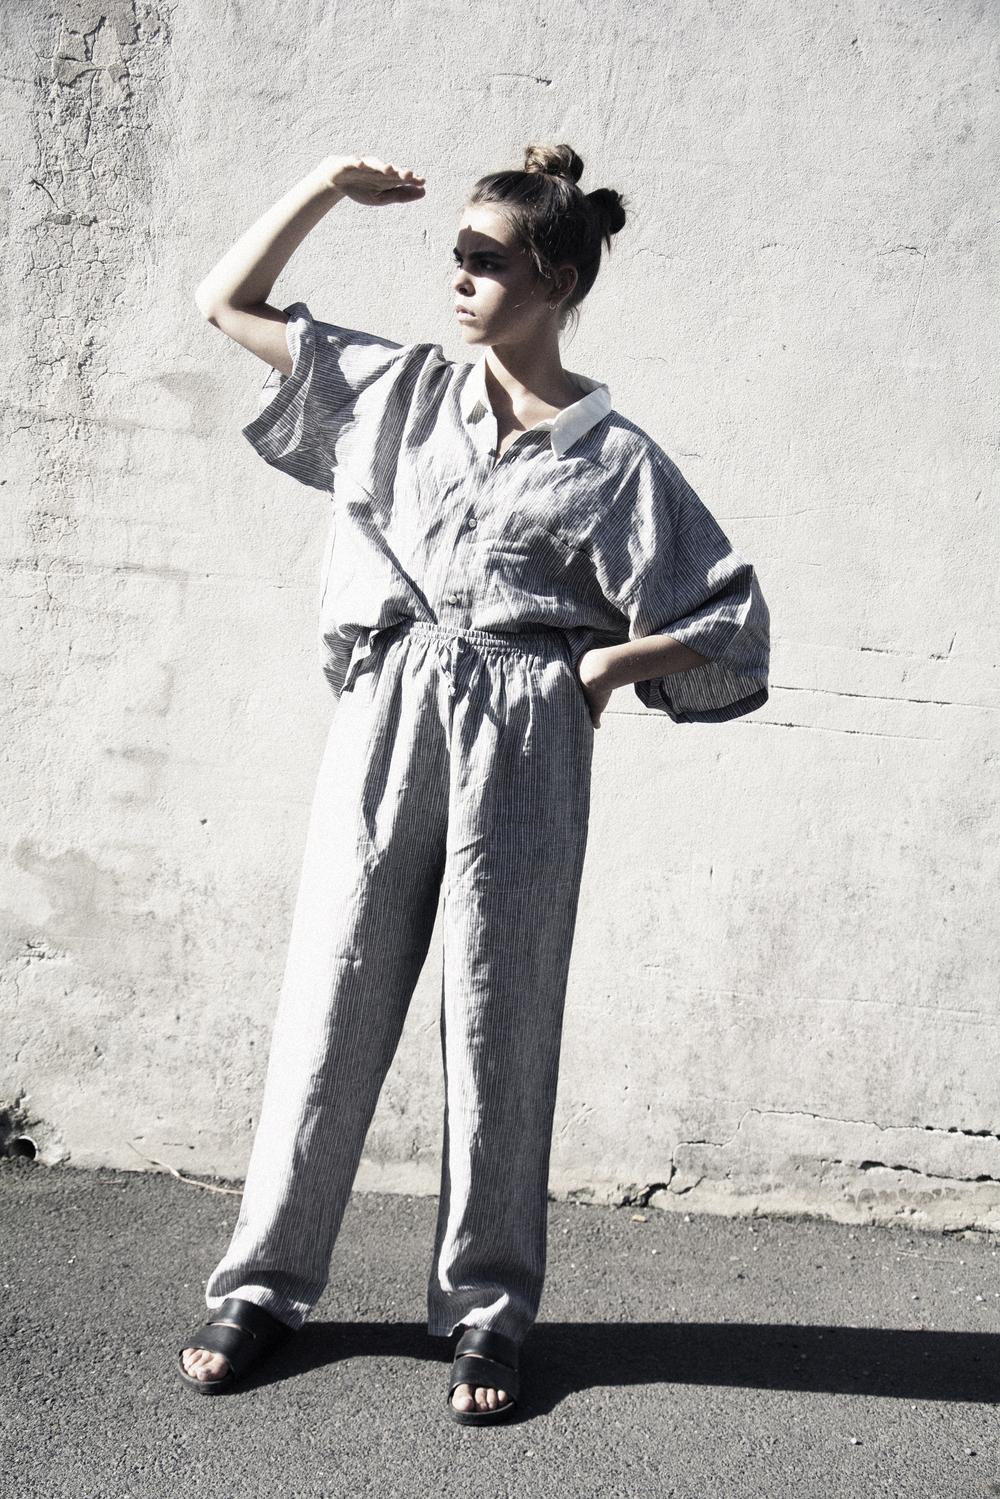 Celeste Tesoriero custom linen pajama set and slides